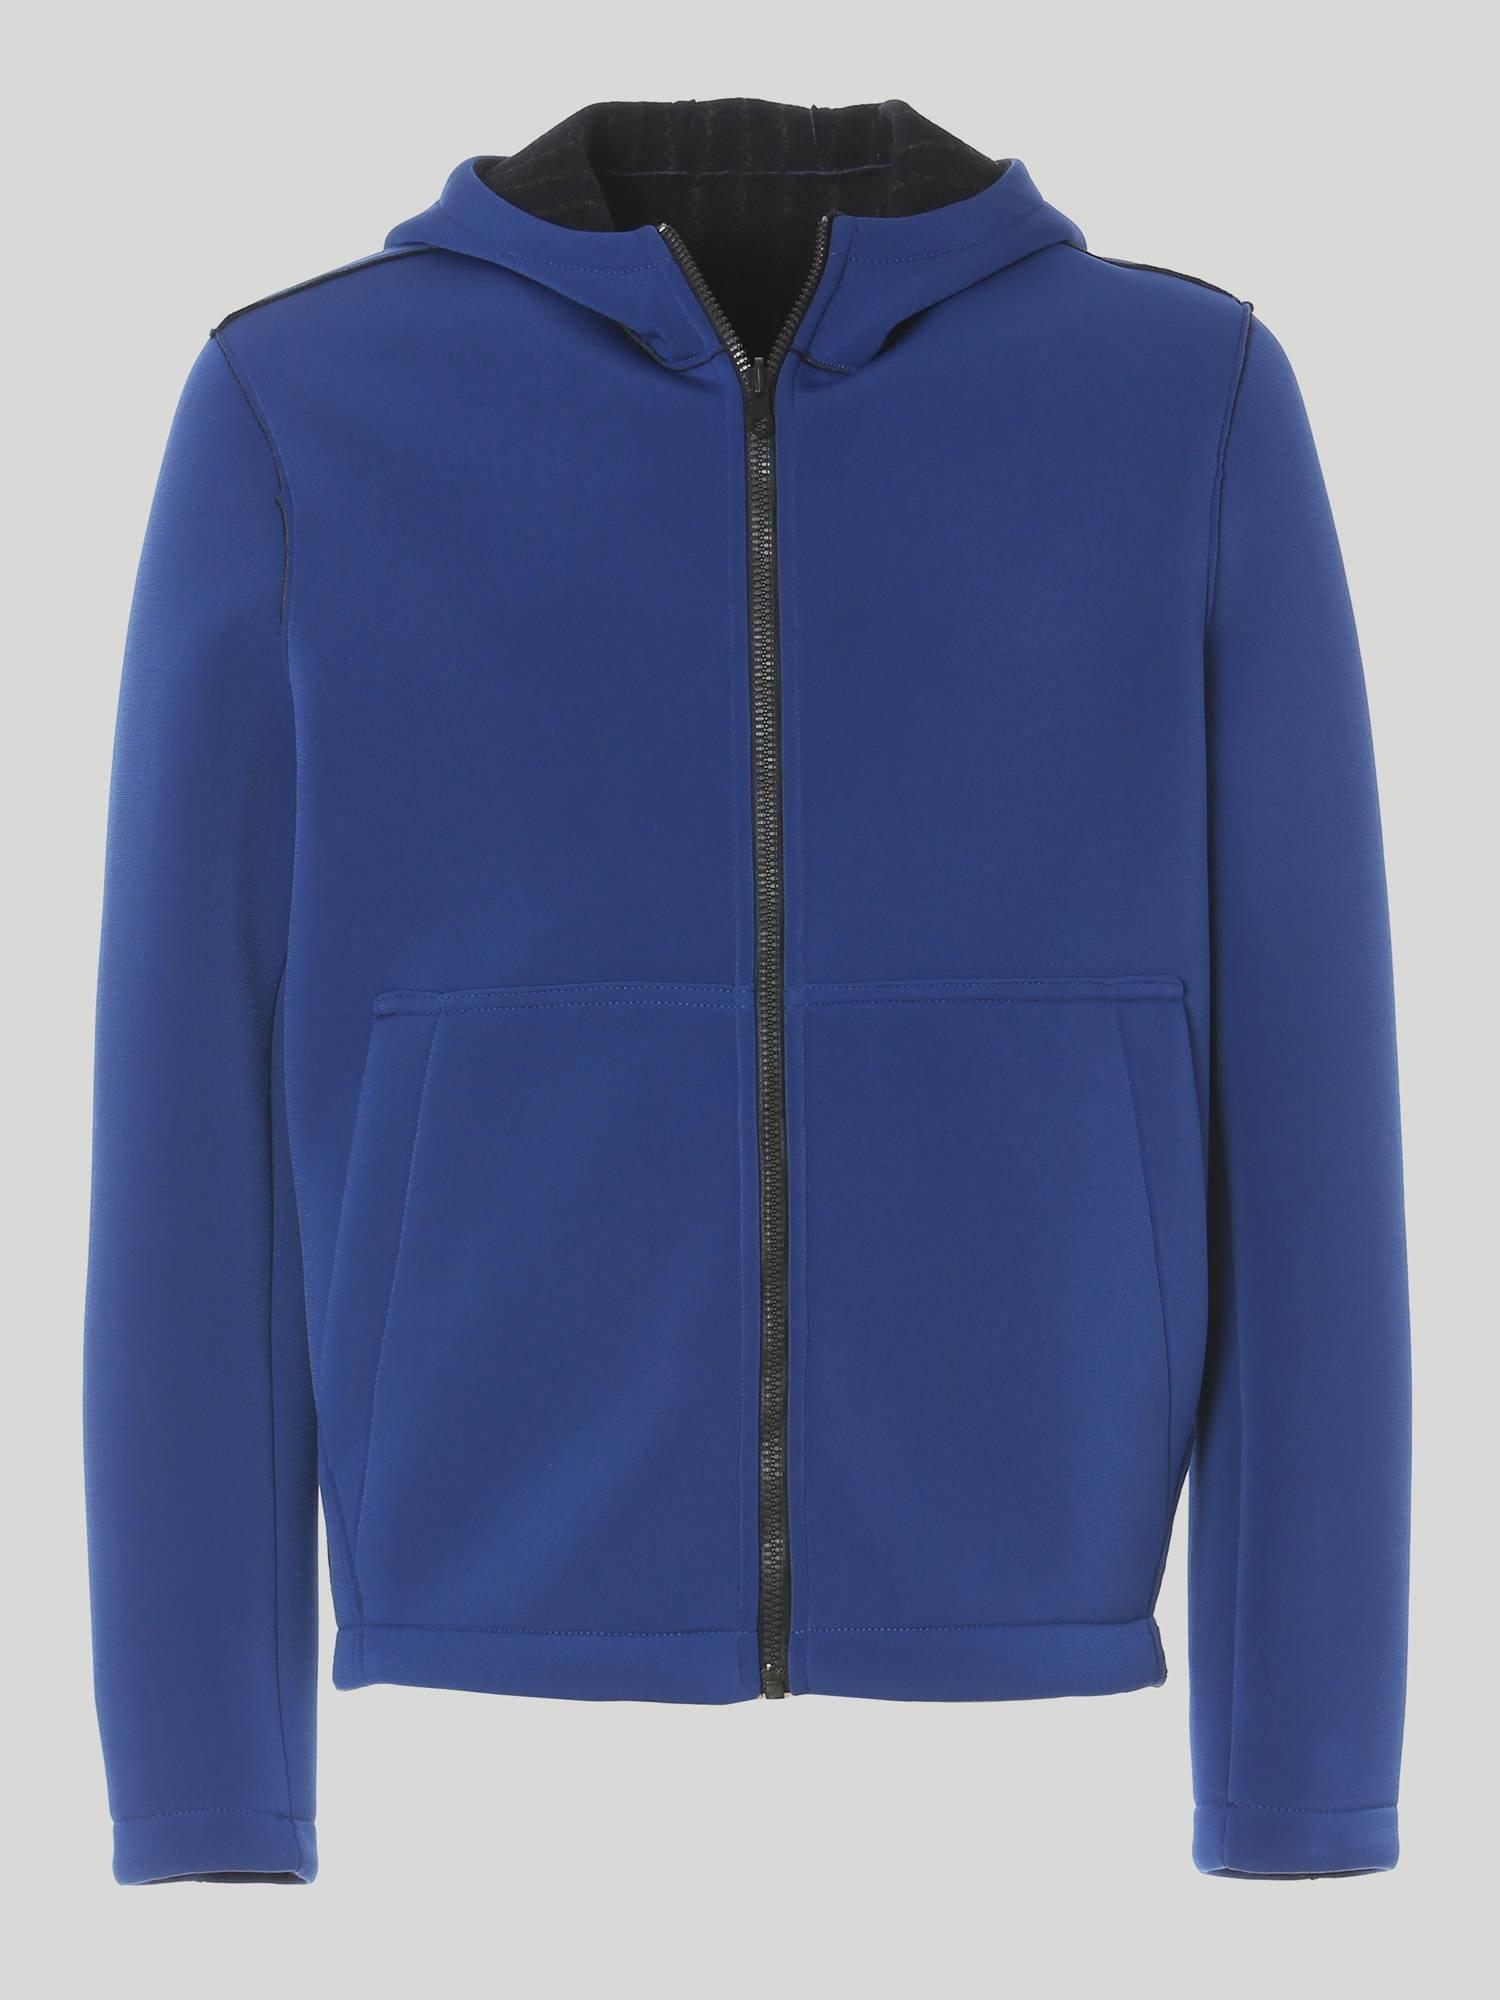 Jacke Drabber - Navy Blau